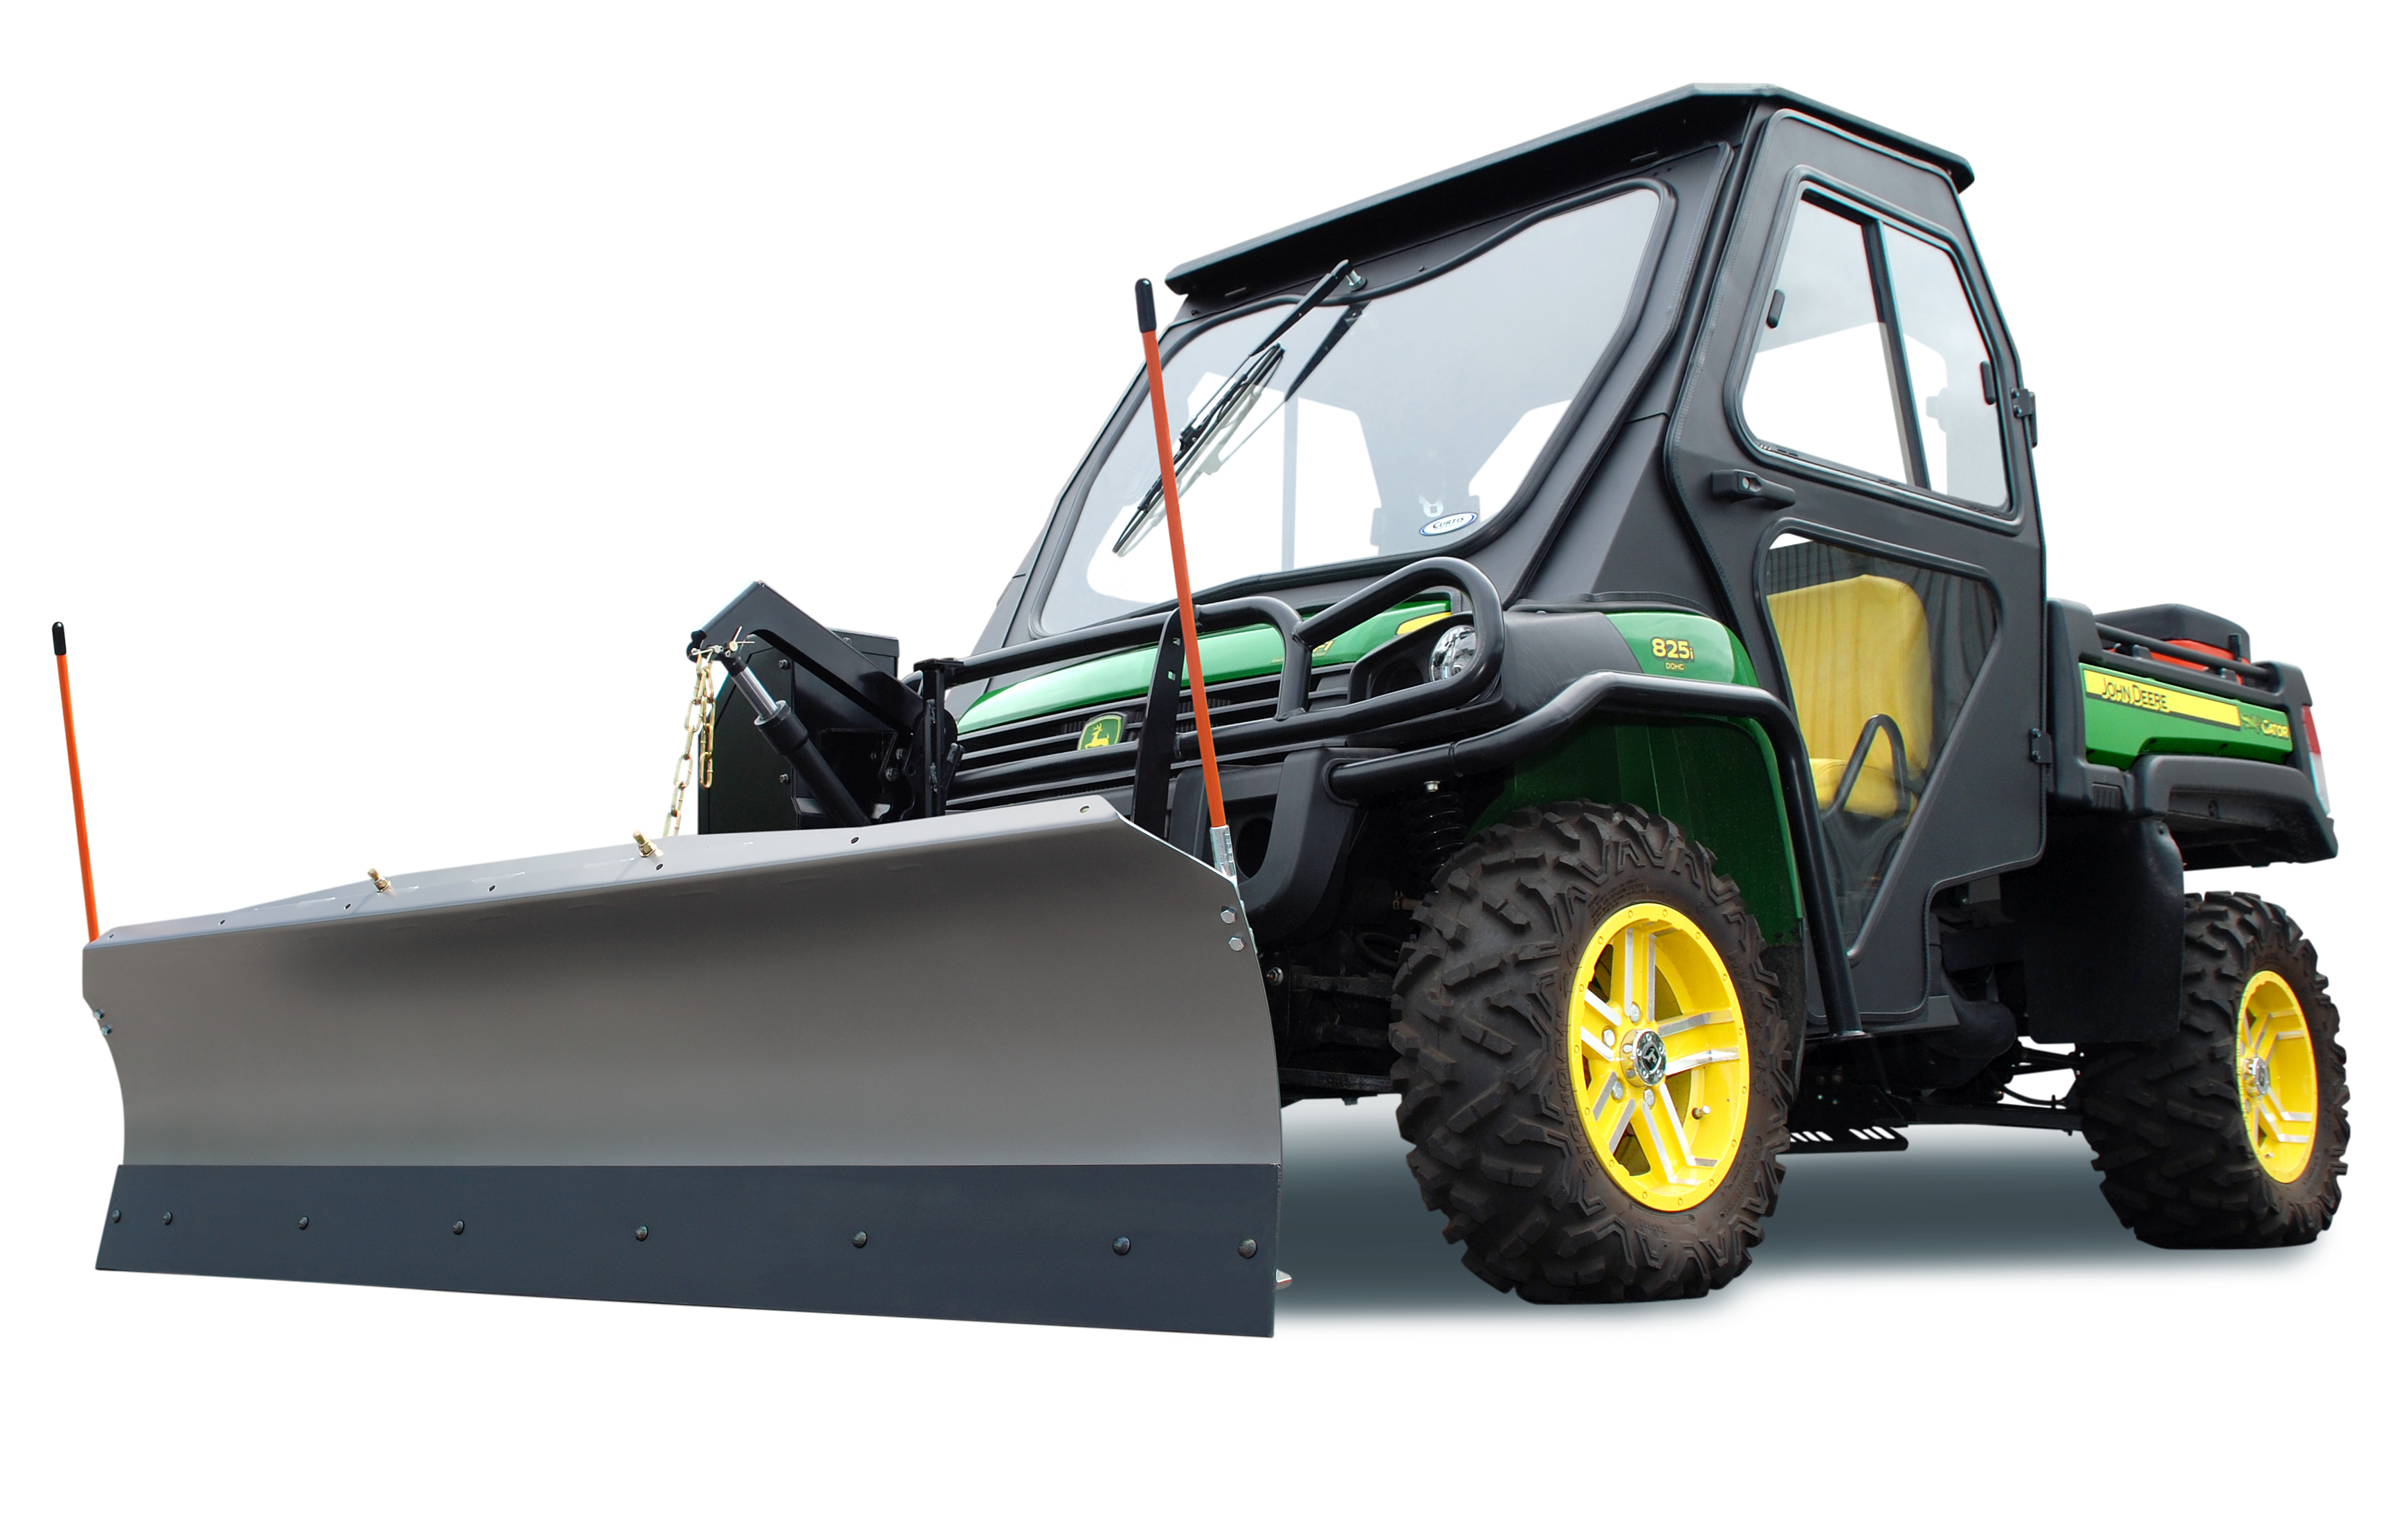 John Deere Gator Plow >> New Utility Vehicle Snow Plow